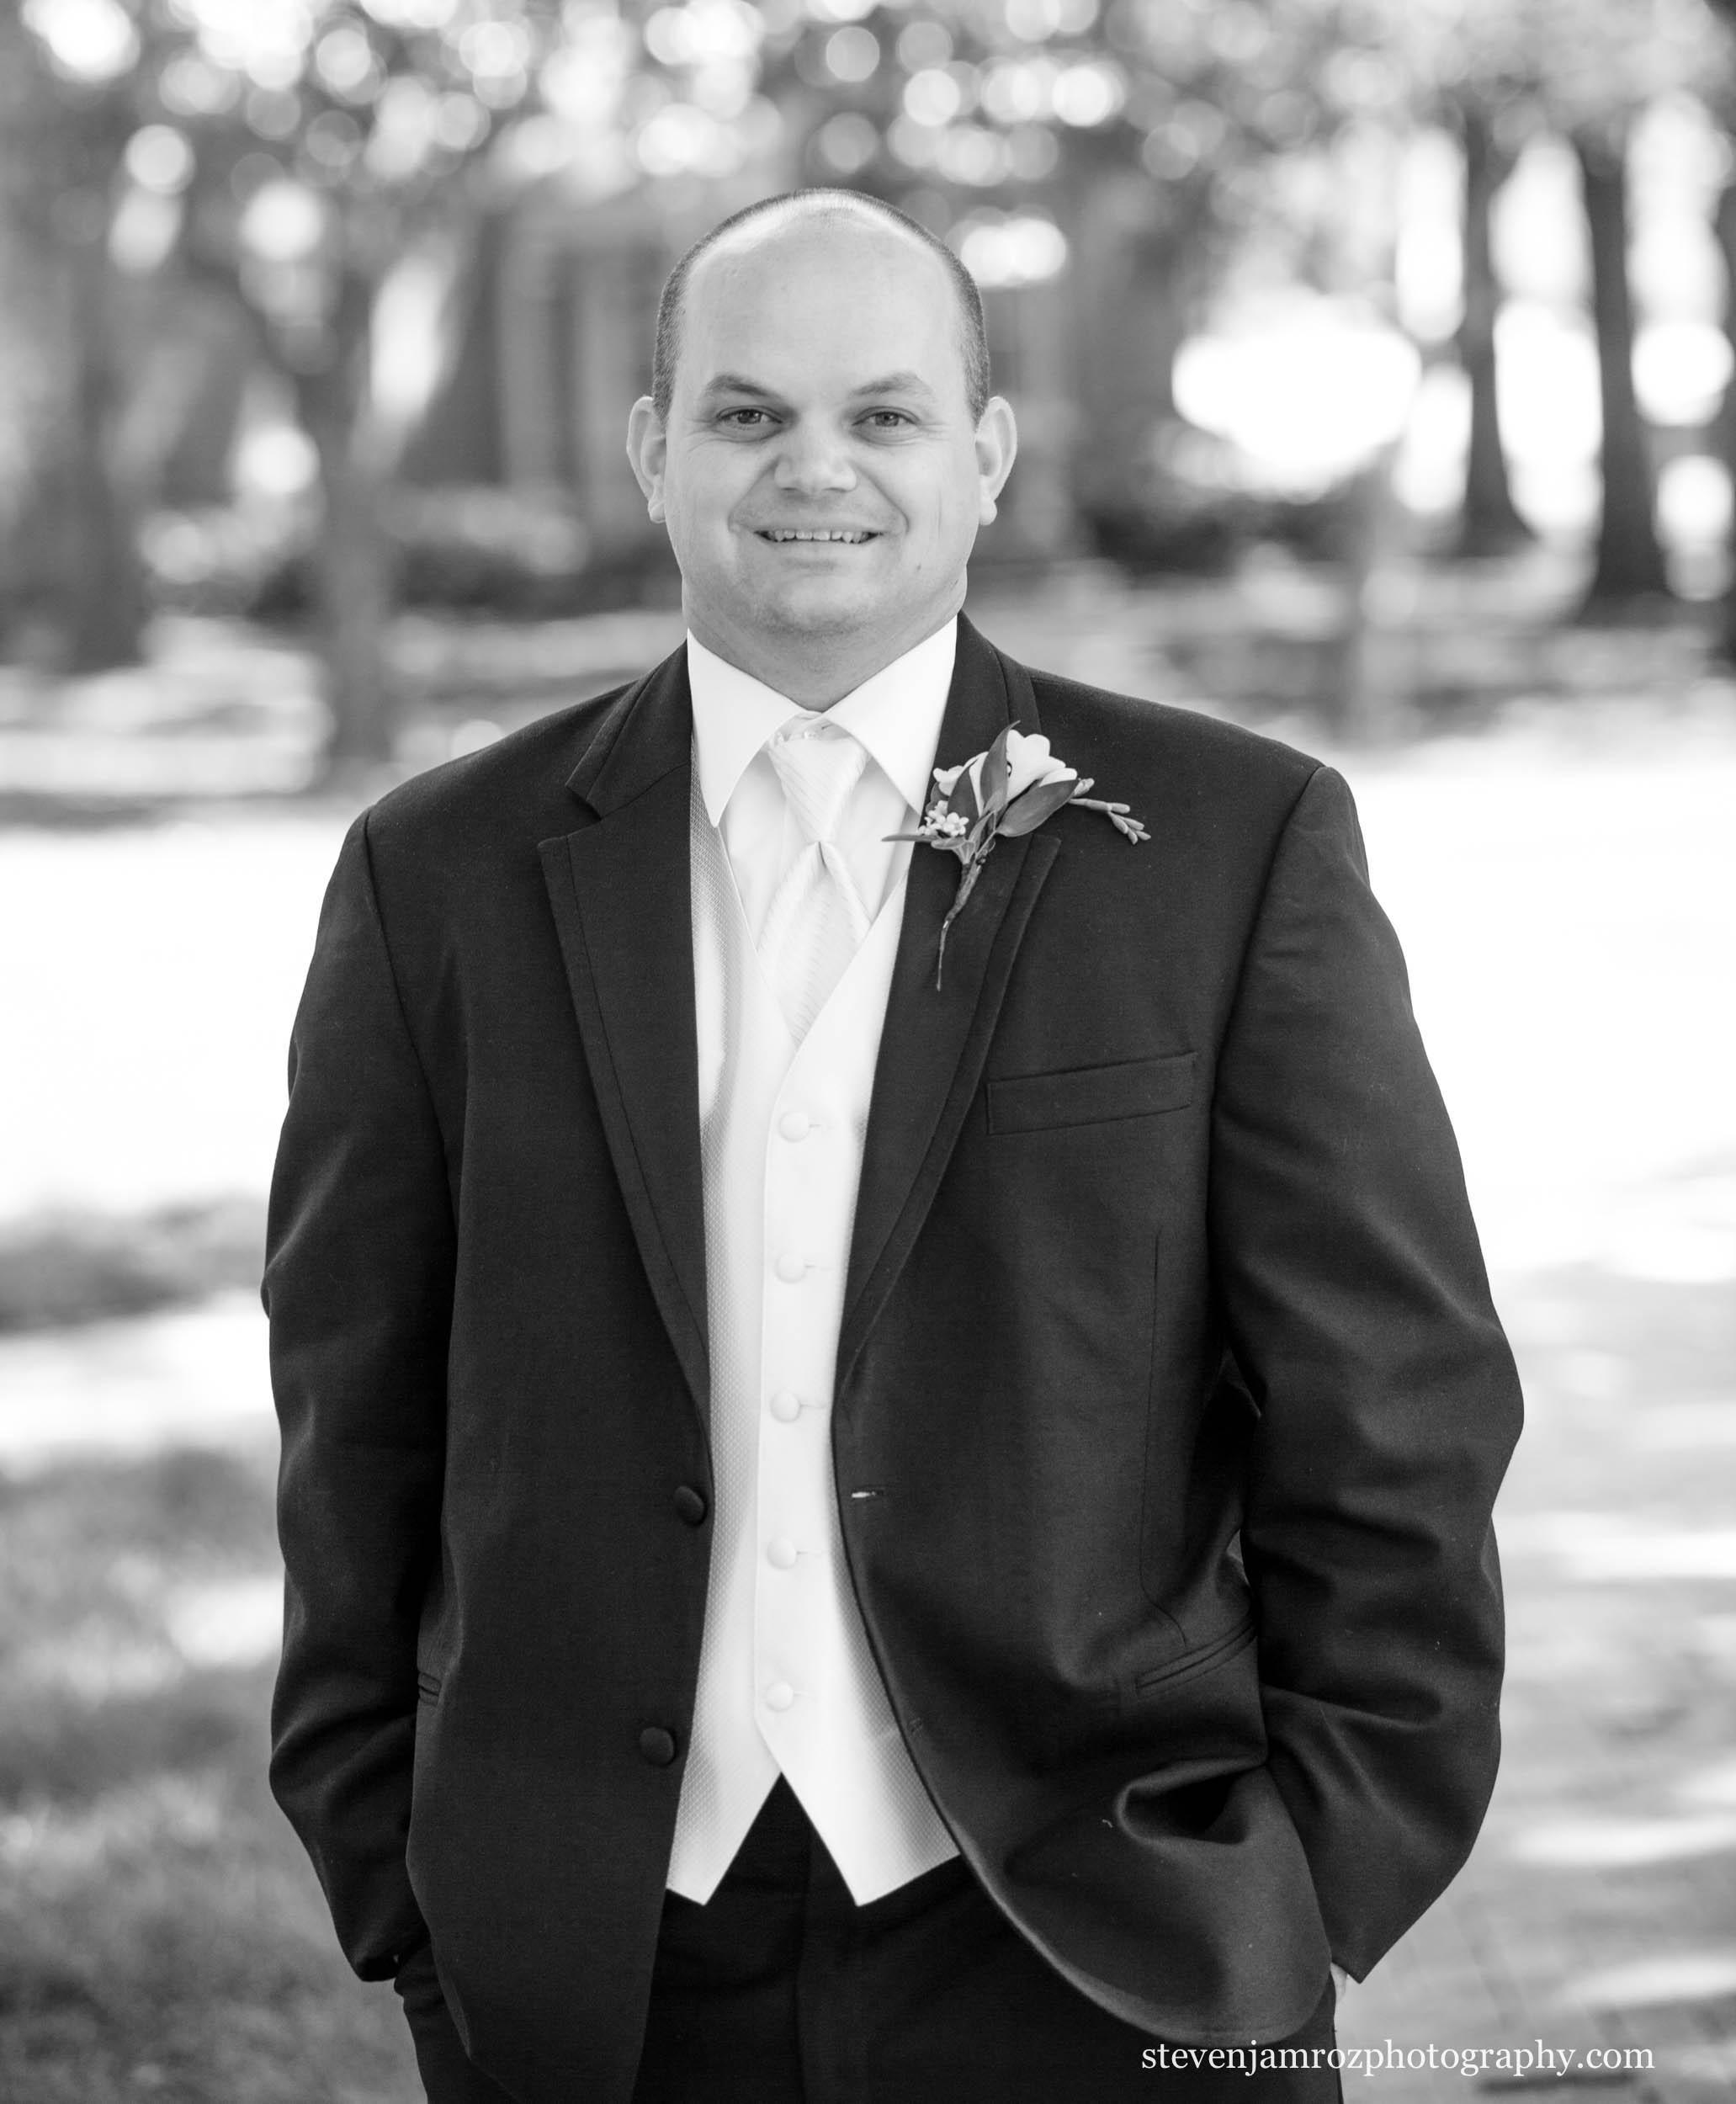 black-tux-groom-portrait-peace-university-raleigh-steven-jamroz-photography-0527.jpg